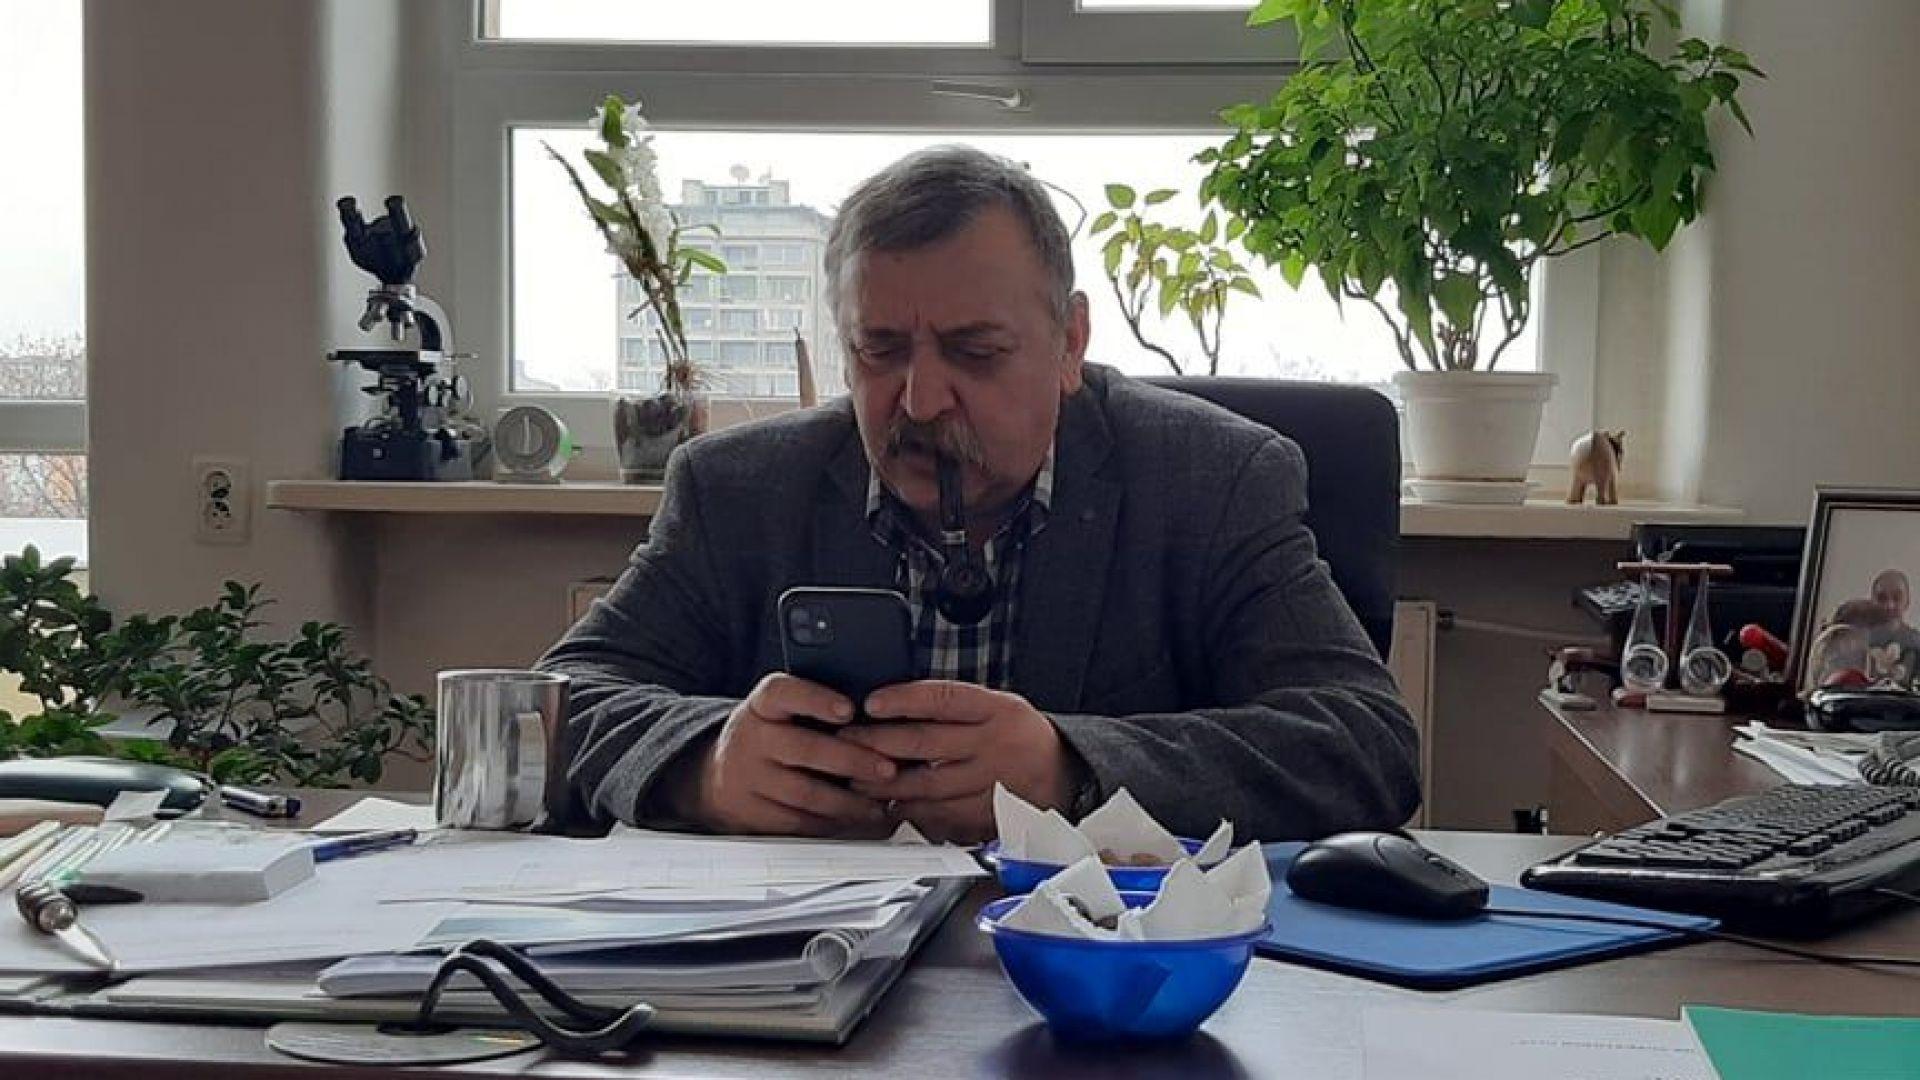 Проф. Кантарджиев пред Dir.bg: Д-р Кацаров ме пенсионира, продължавайте без мен